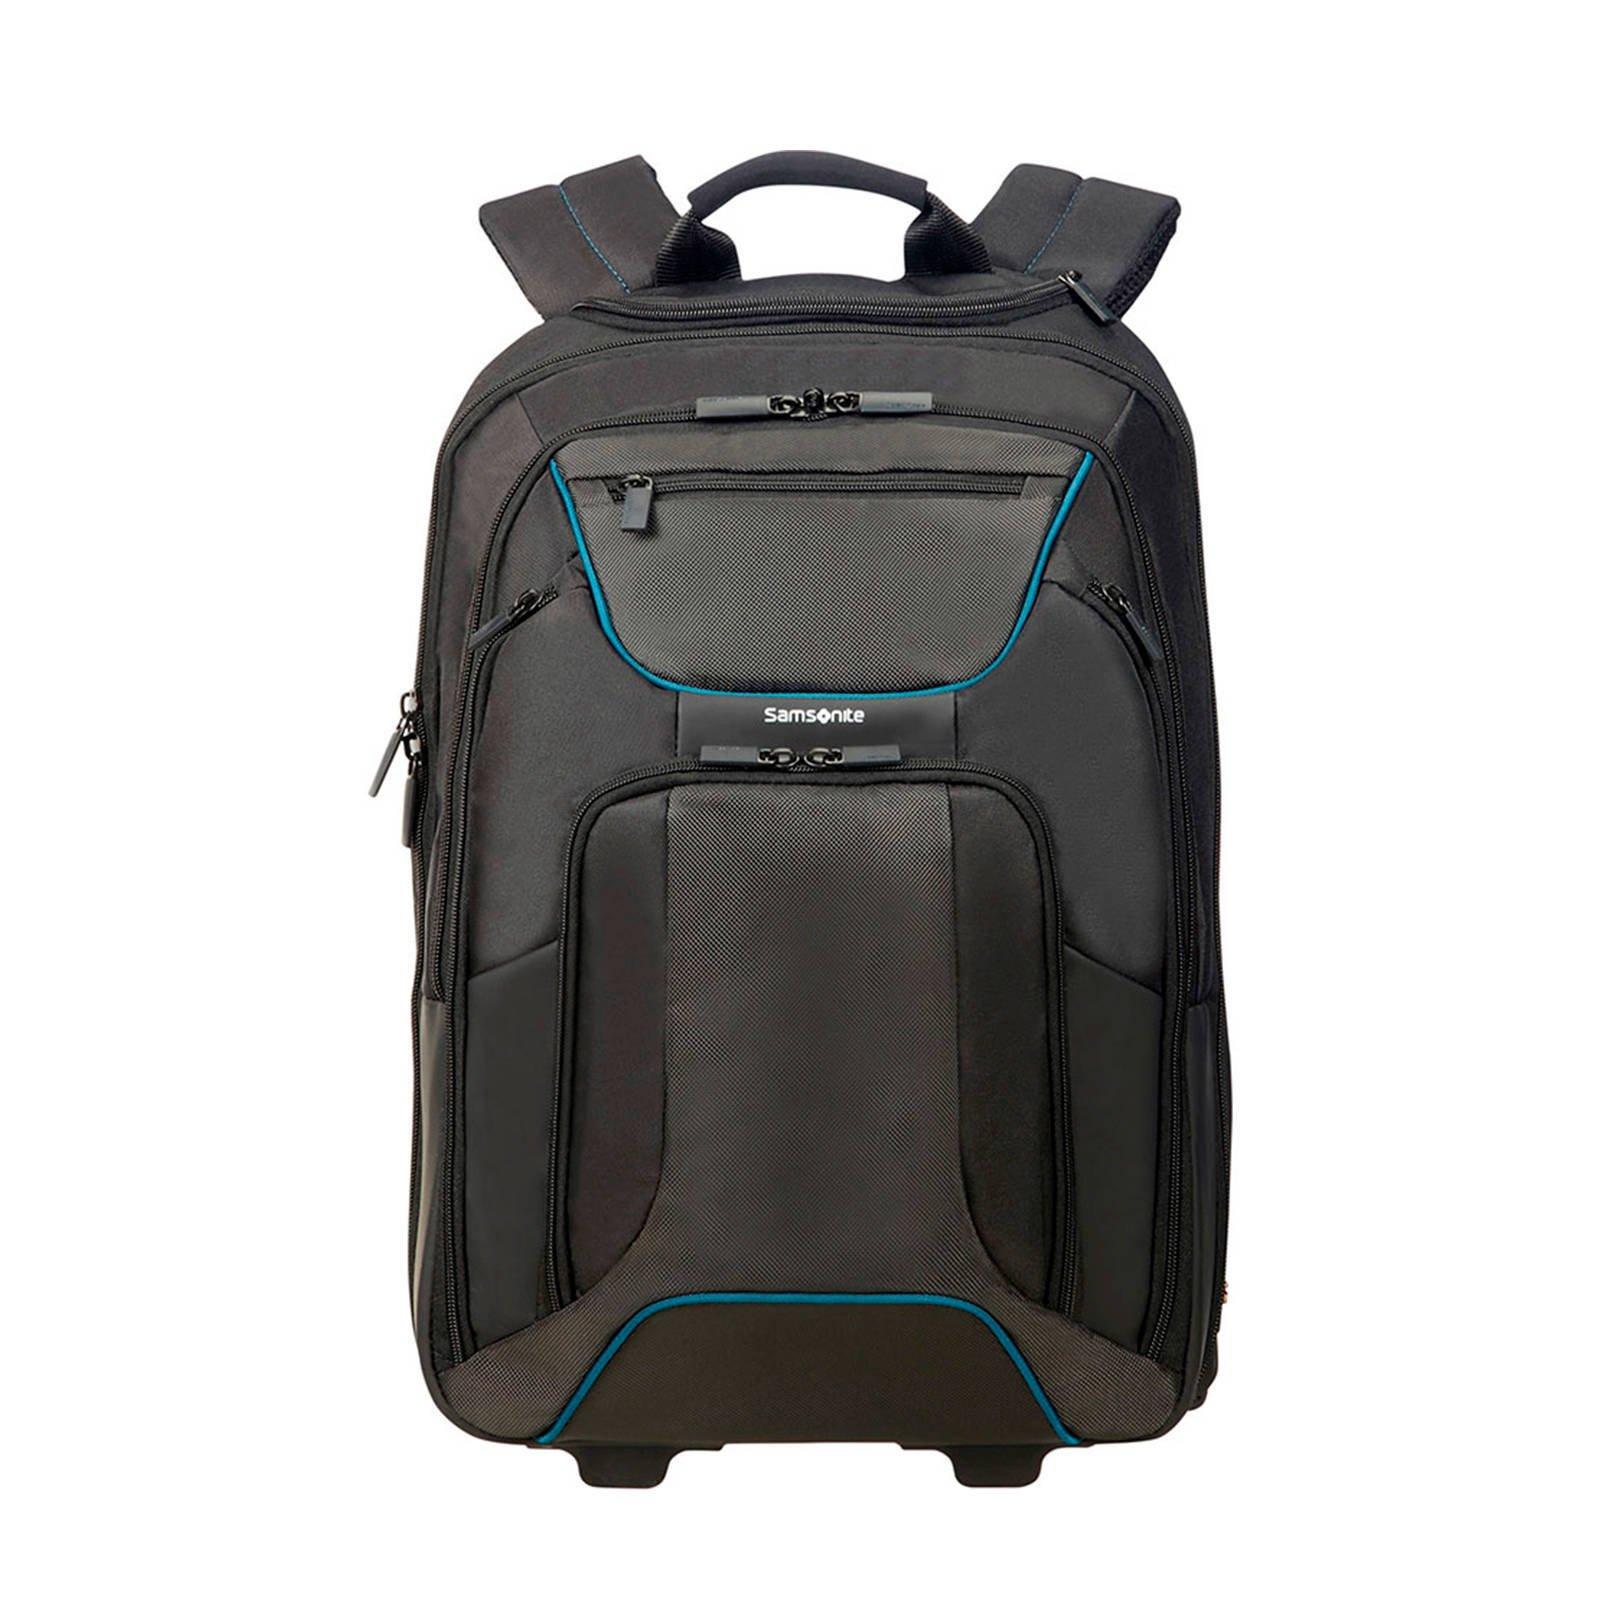 aff70ec2792 Samsonite laptop rugzak 17,3 inch laptoptas trolley | wehkamp